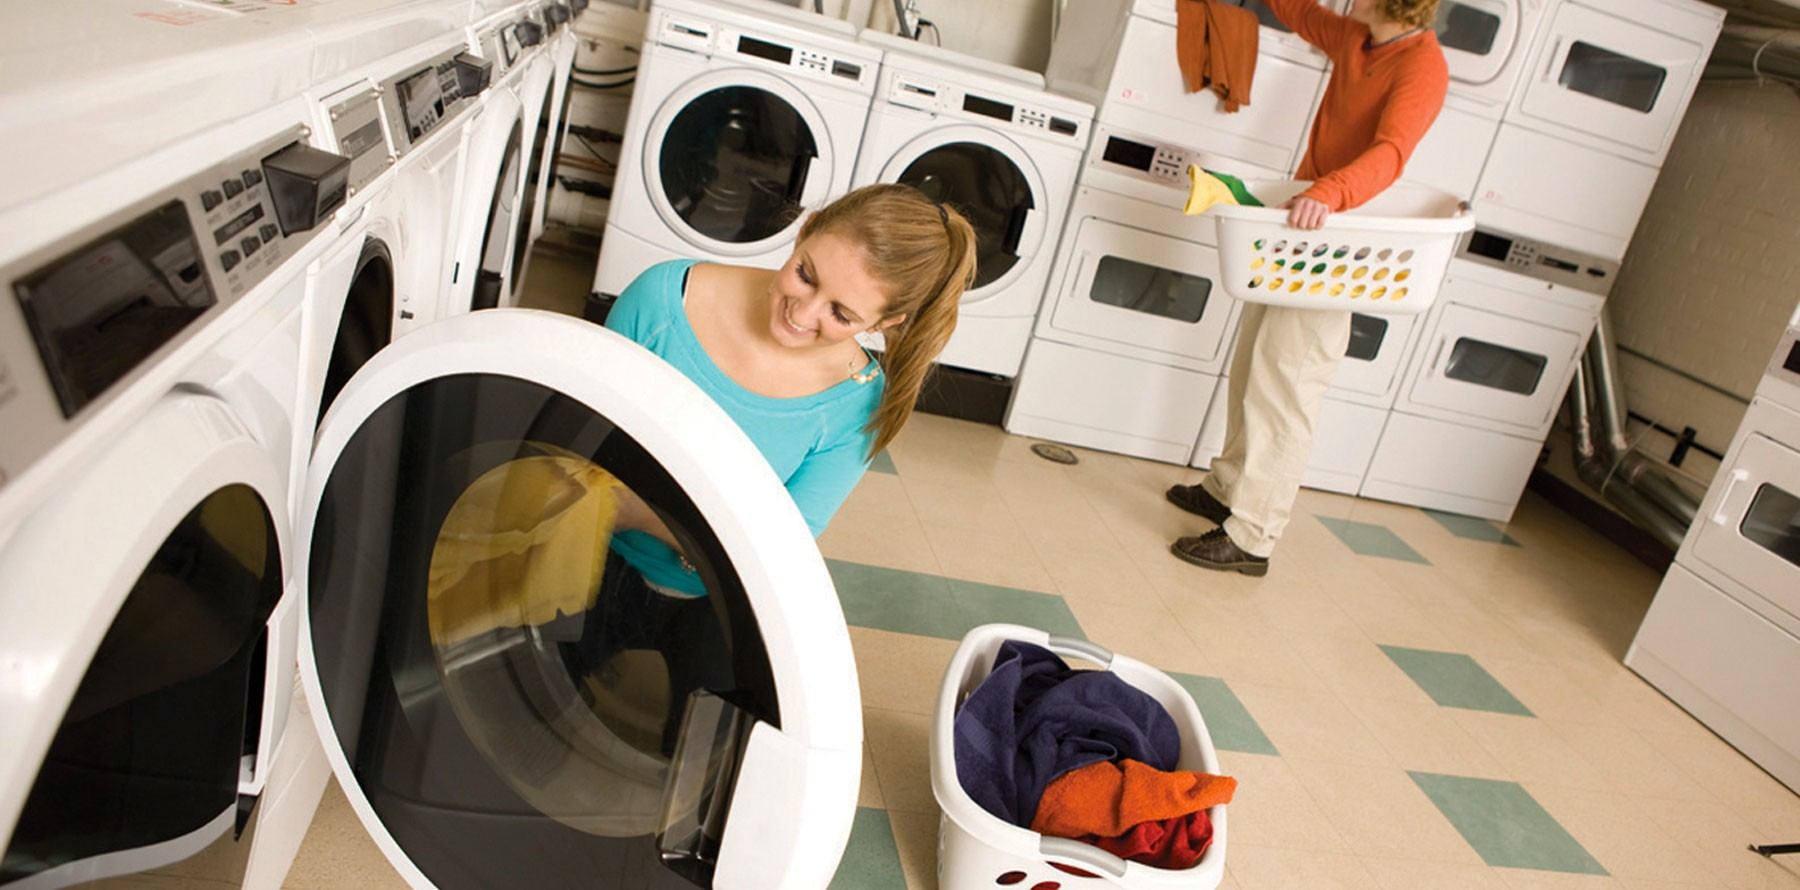 Multihousing Laundry Facility BDS Laundry